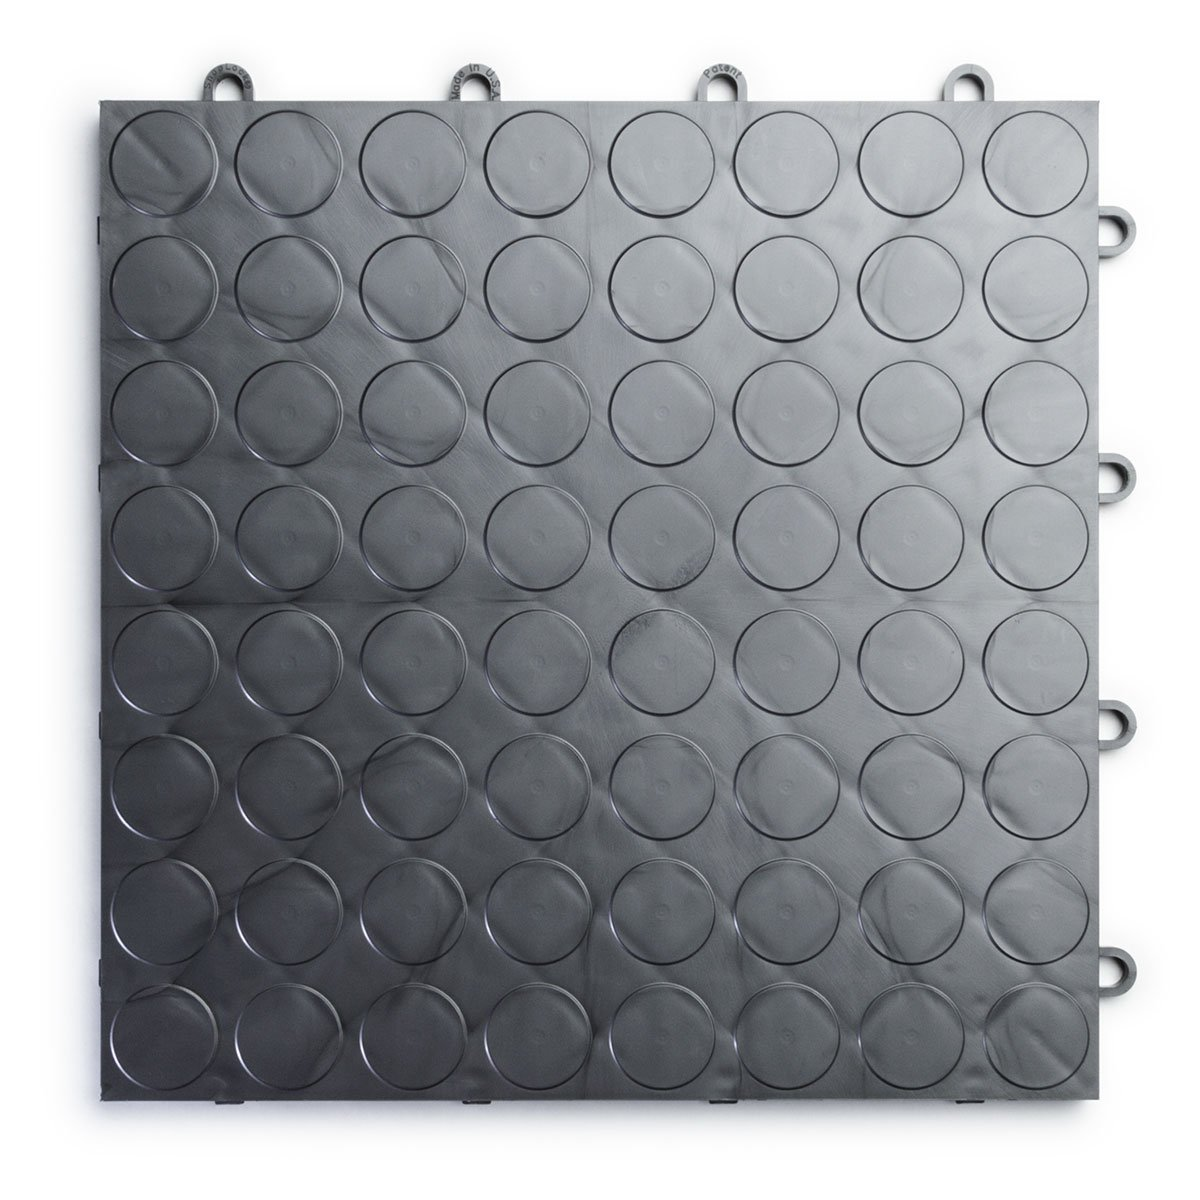 RaceDeck CircleTrac, Durable Interlocking Modular Garage Flooring Tile (24 Pack), Graphite by RaceDeck